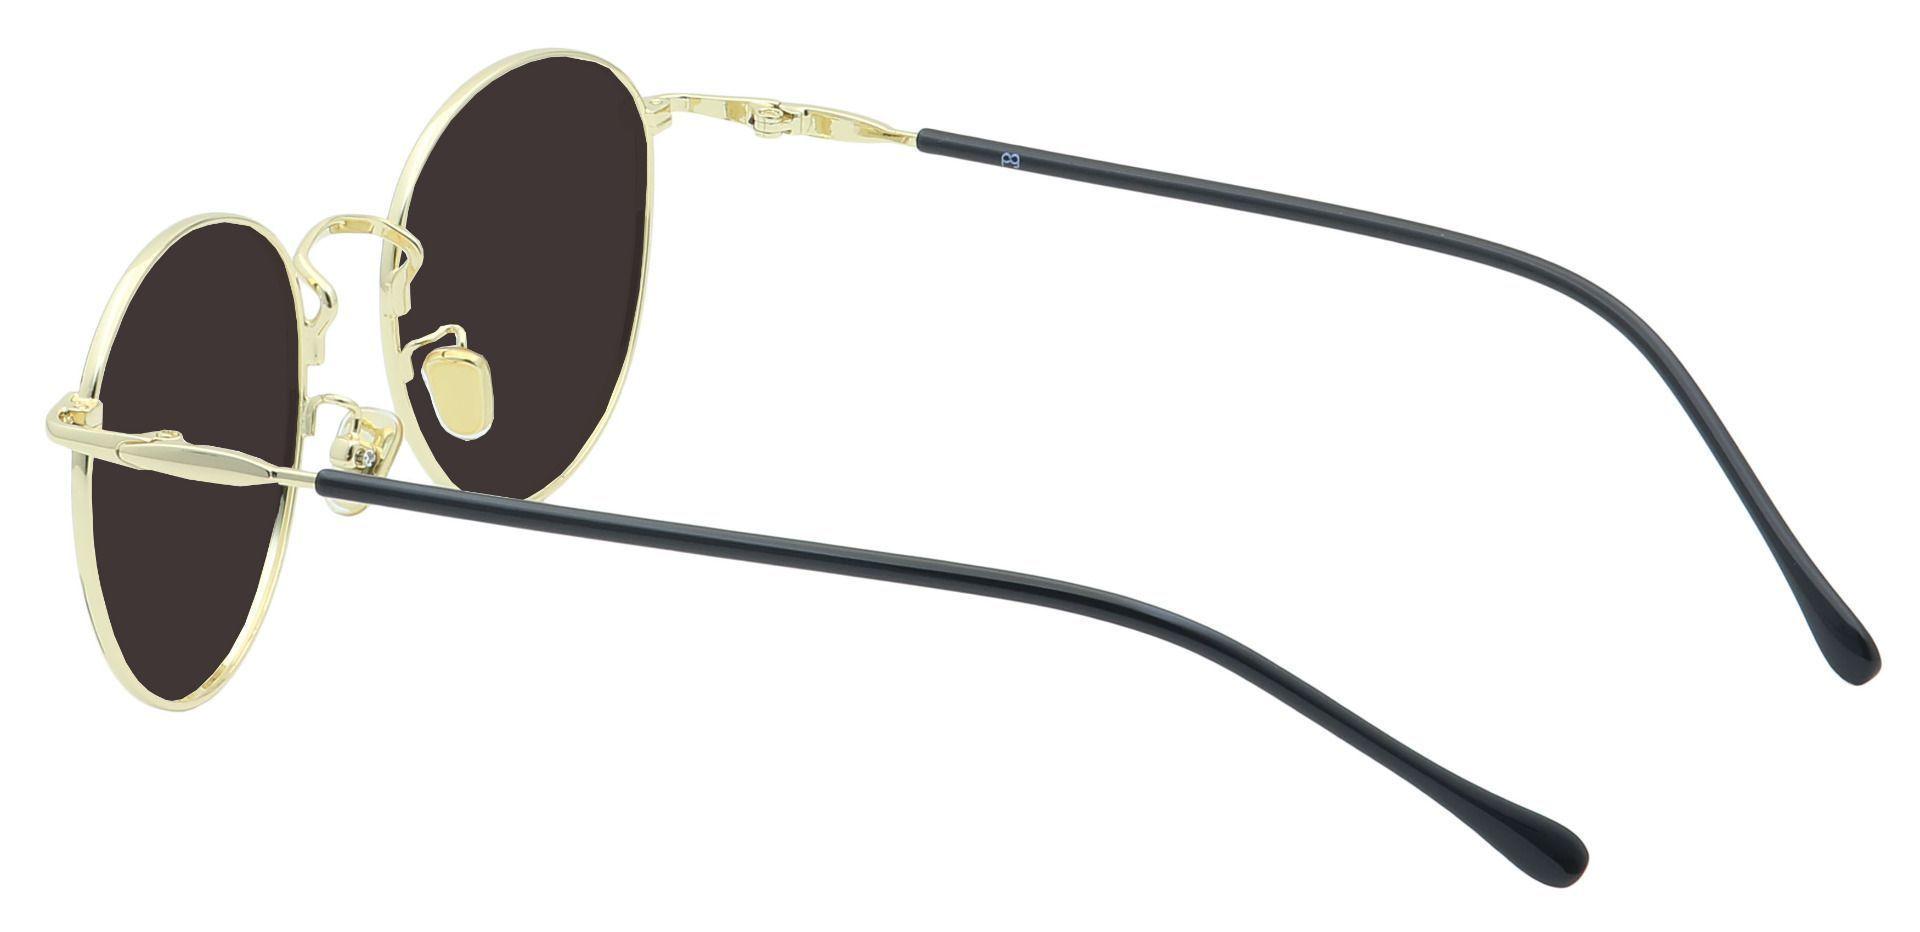 Metro Round Prescription Sunglasses - Black Frame With Gray Lenses